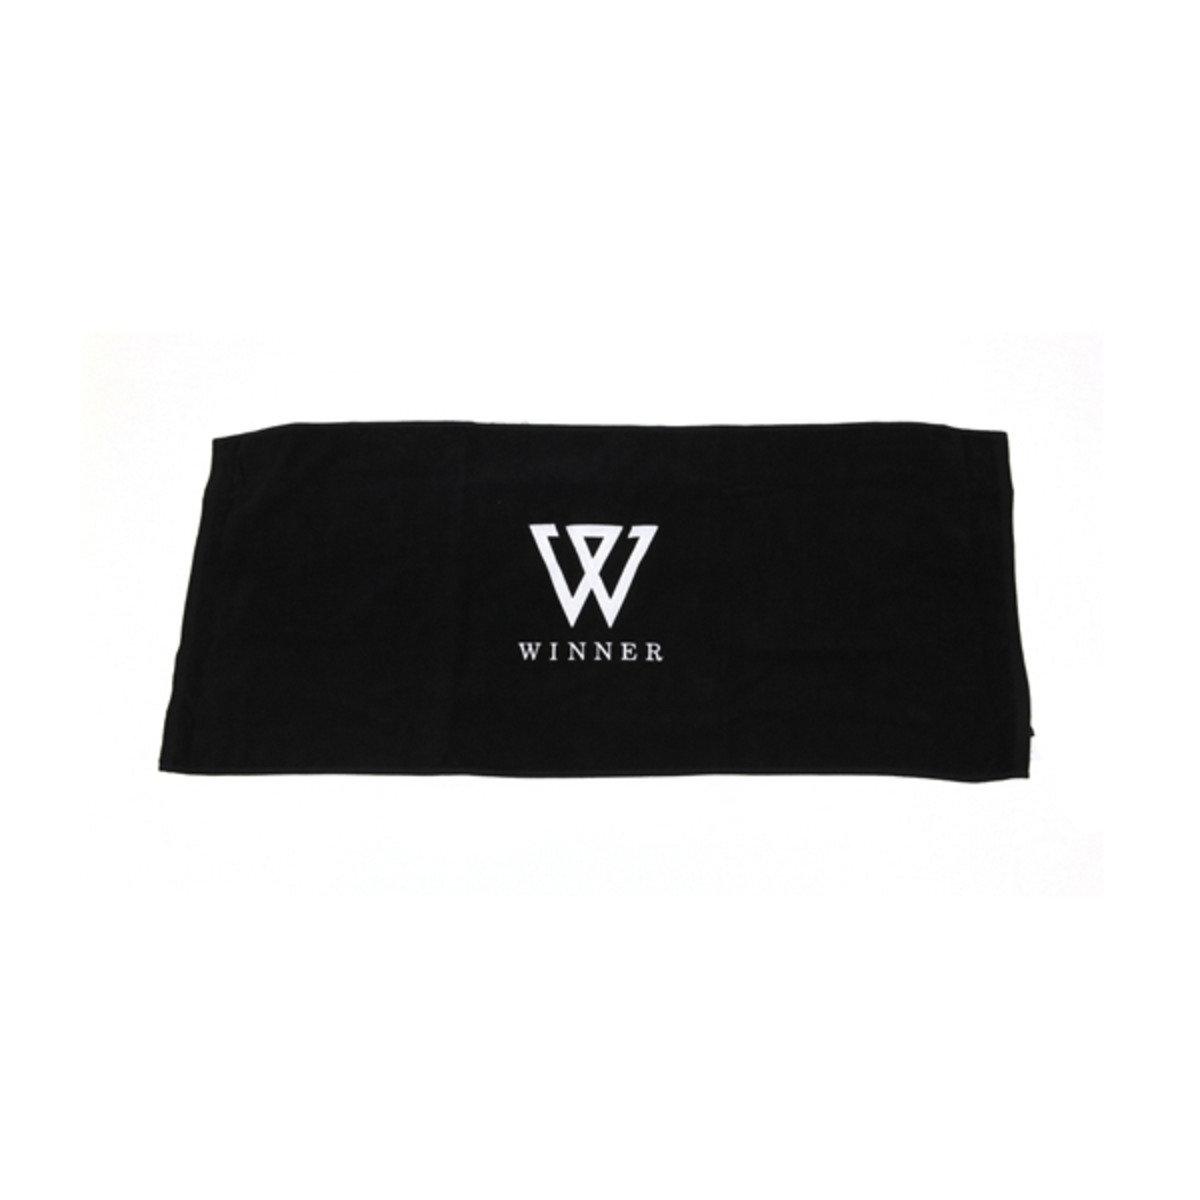 WINNER WWIC 2015 應援巾_GD00012496